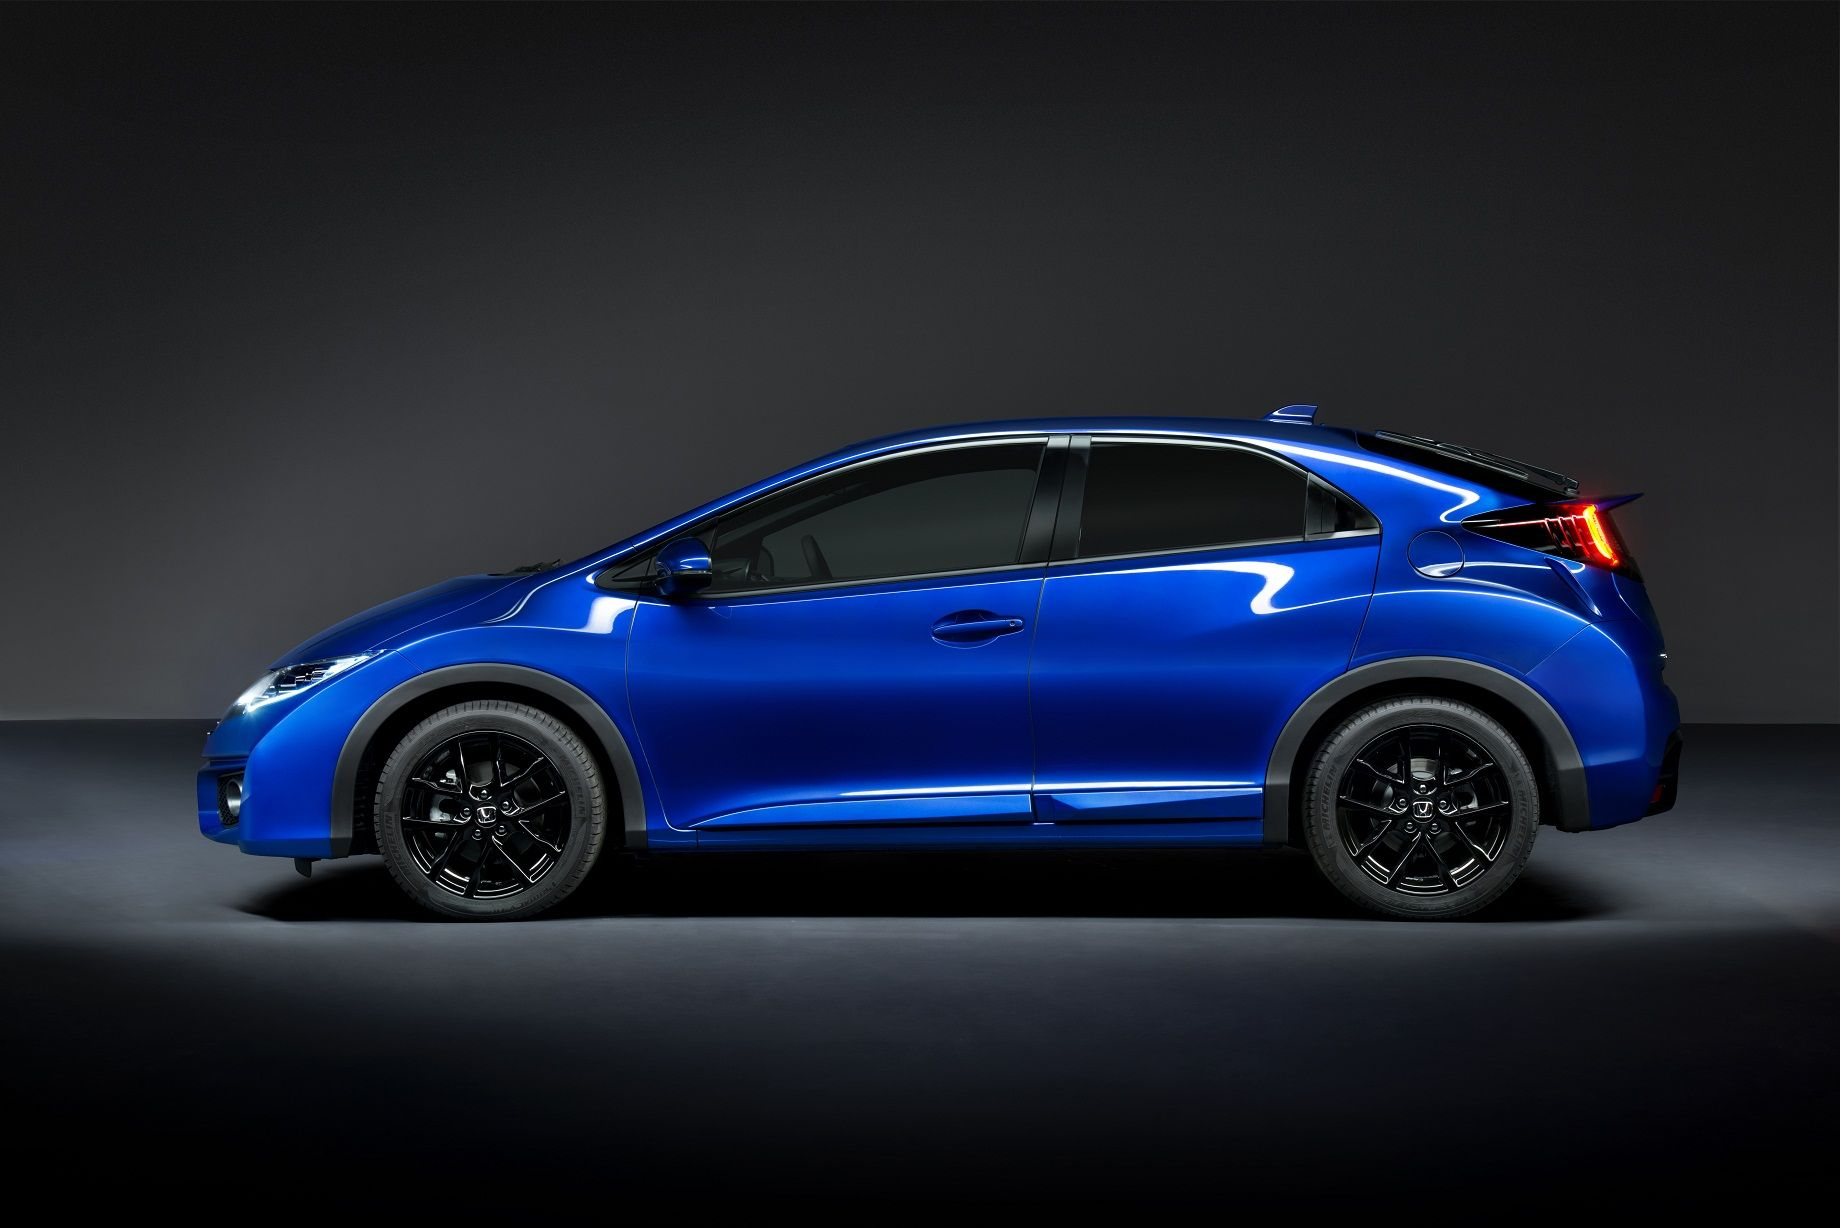 Honda Civic Si in Brilliant Sporty Blue Honda civic